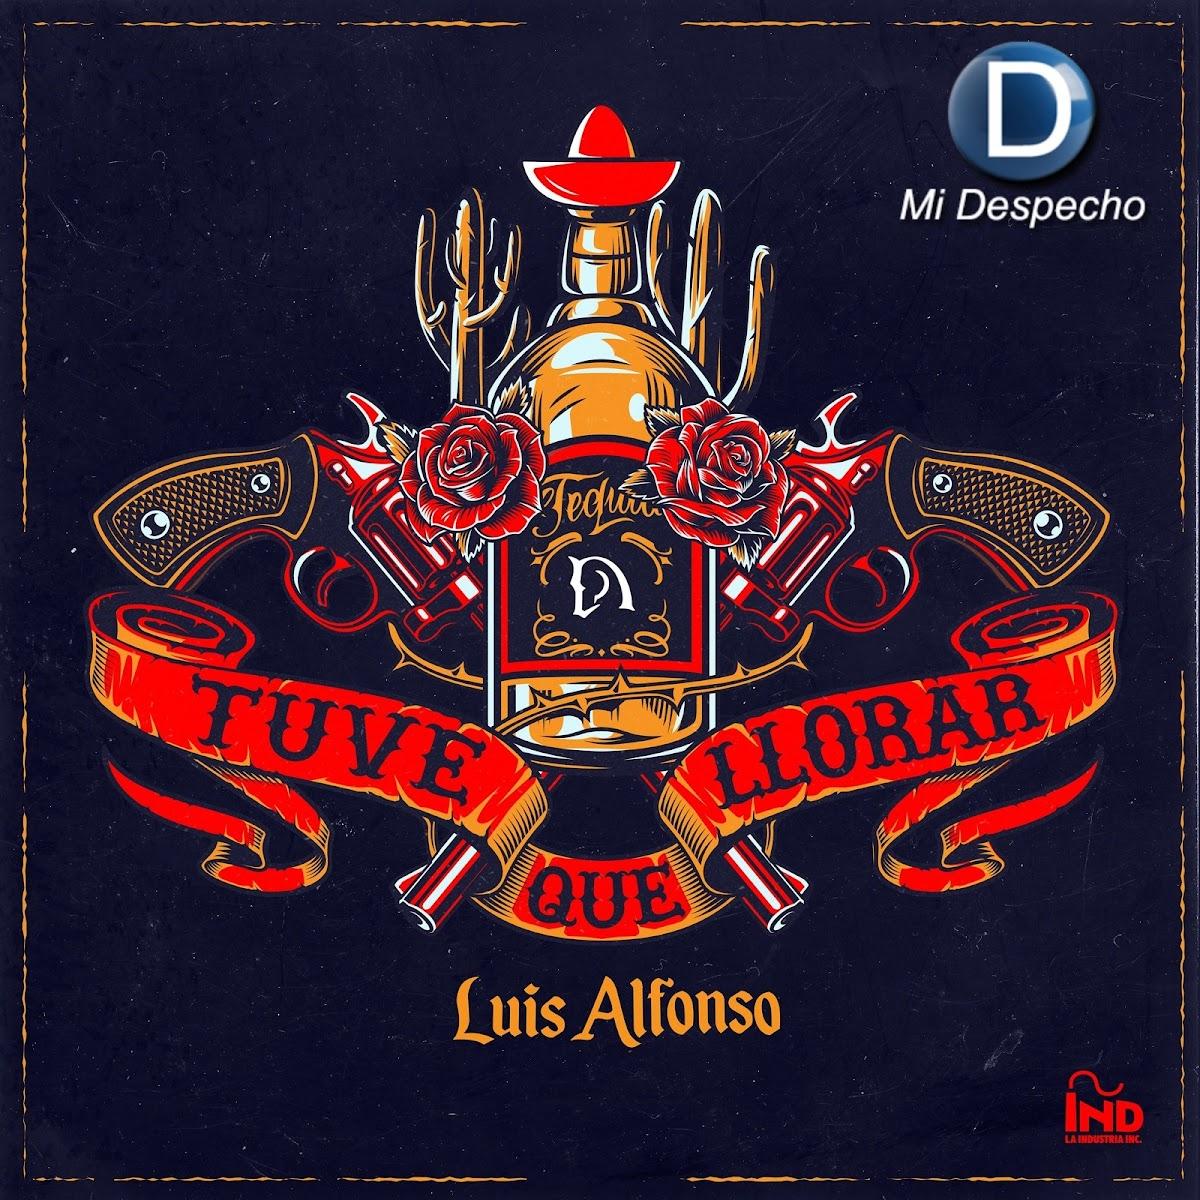 Luis Alfonso Tuve Que Llorar Frontal